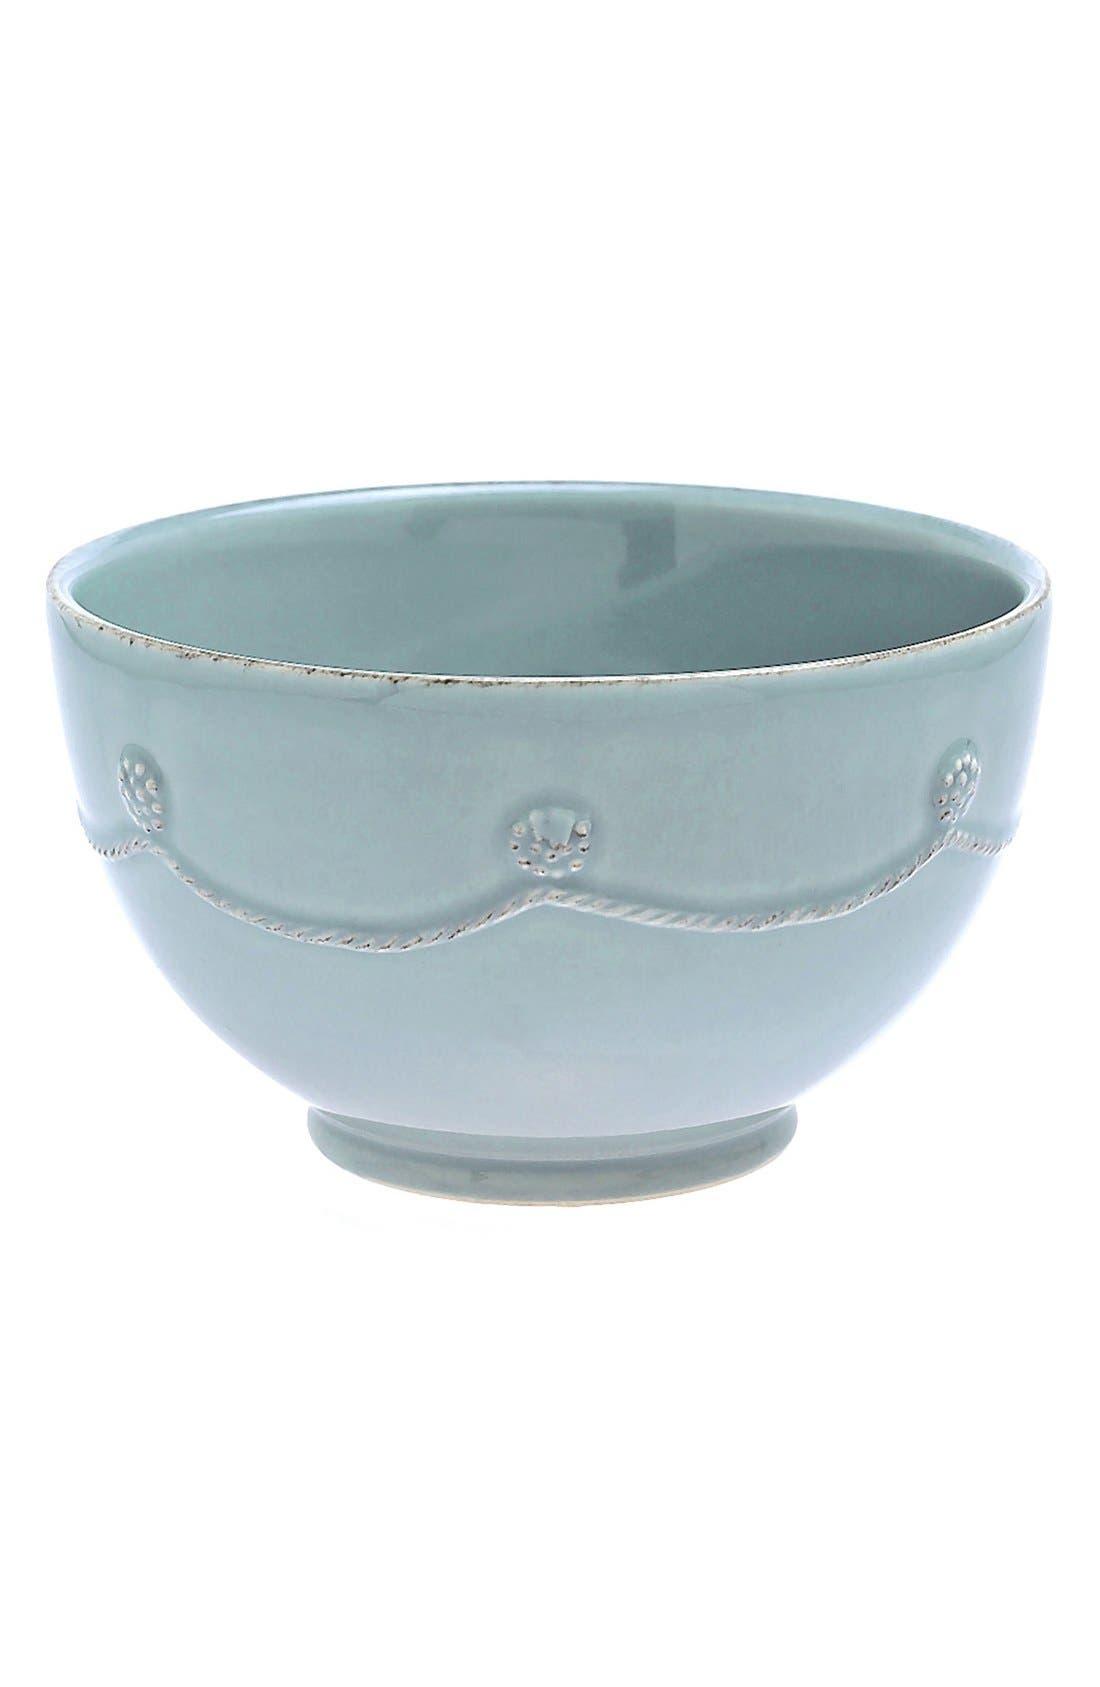 Main Image - Juliska'Berry and Thread' Soup Bowl